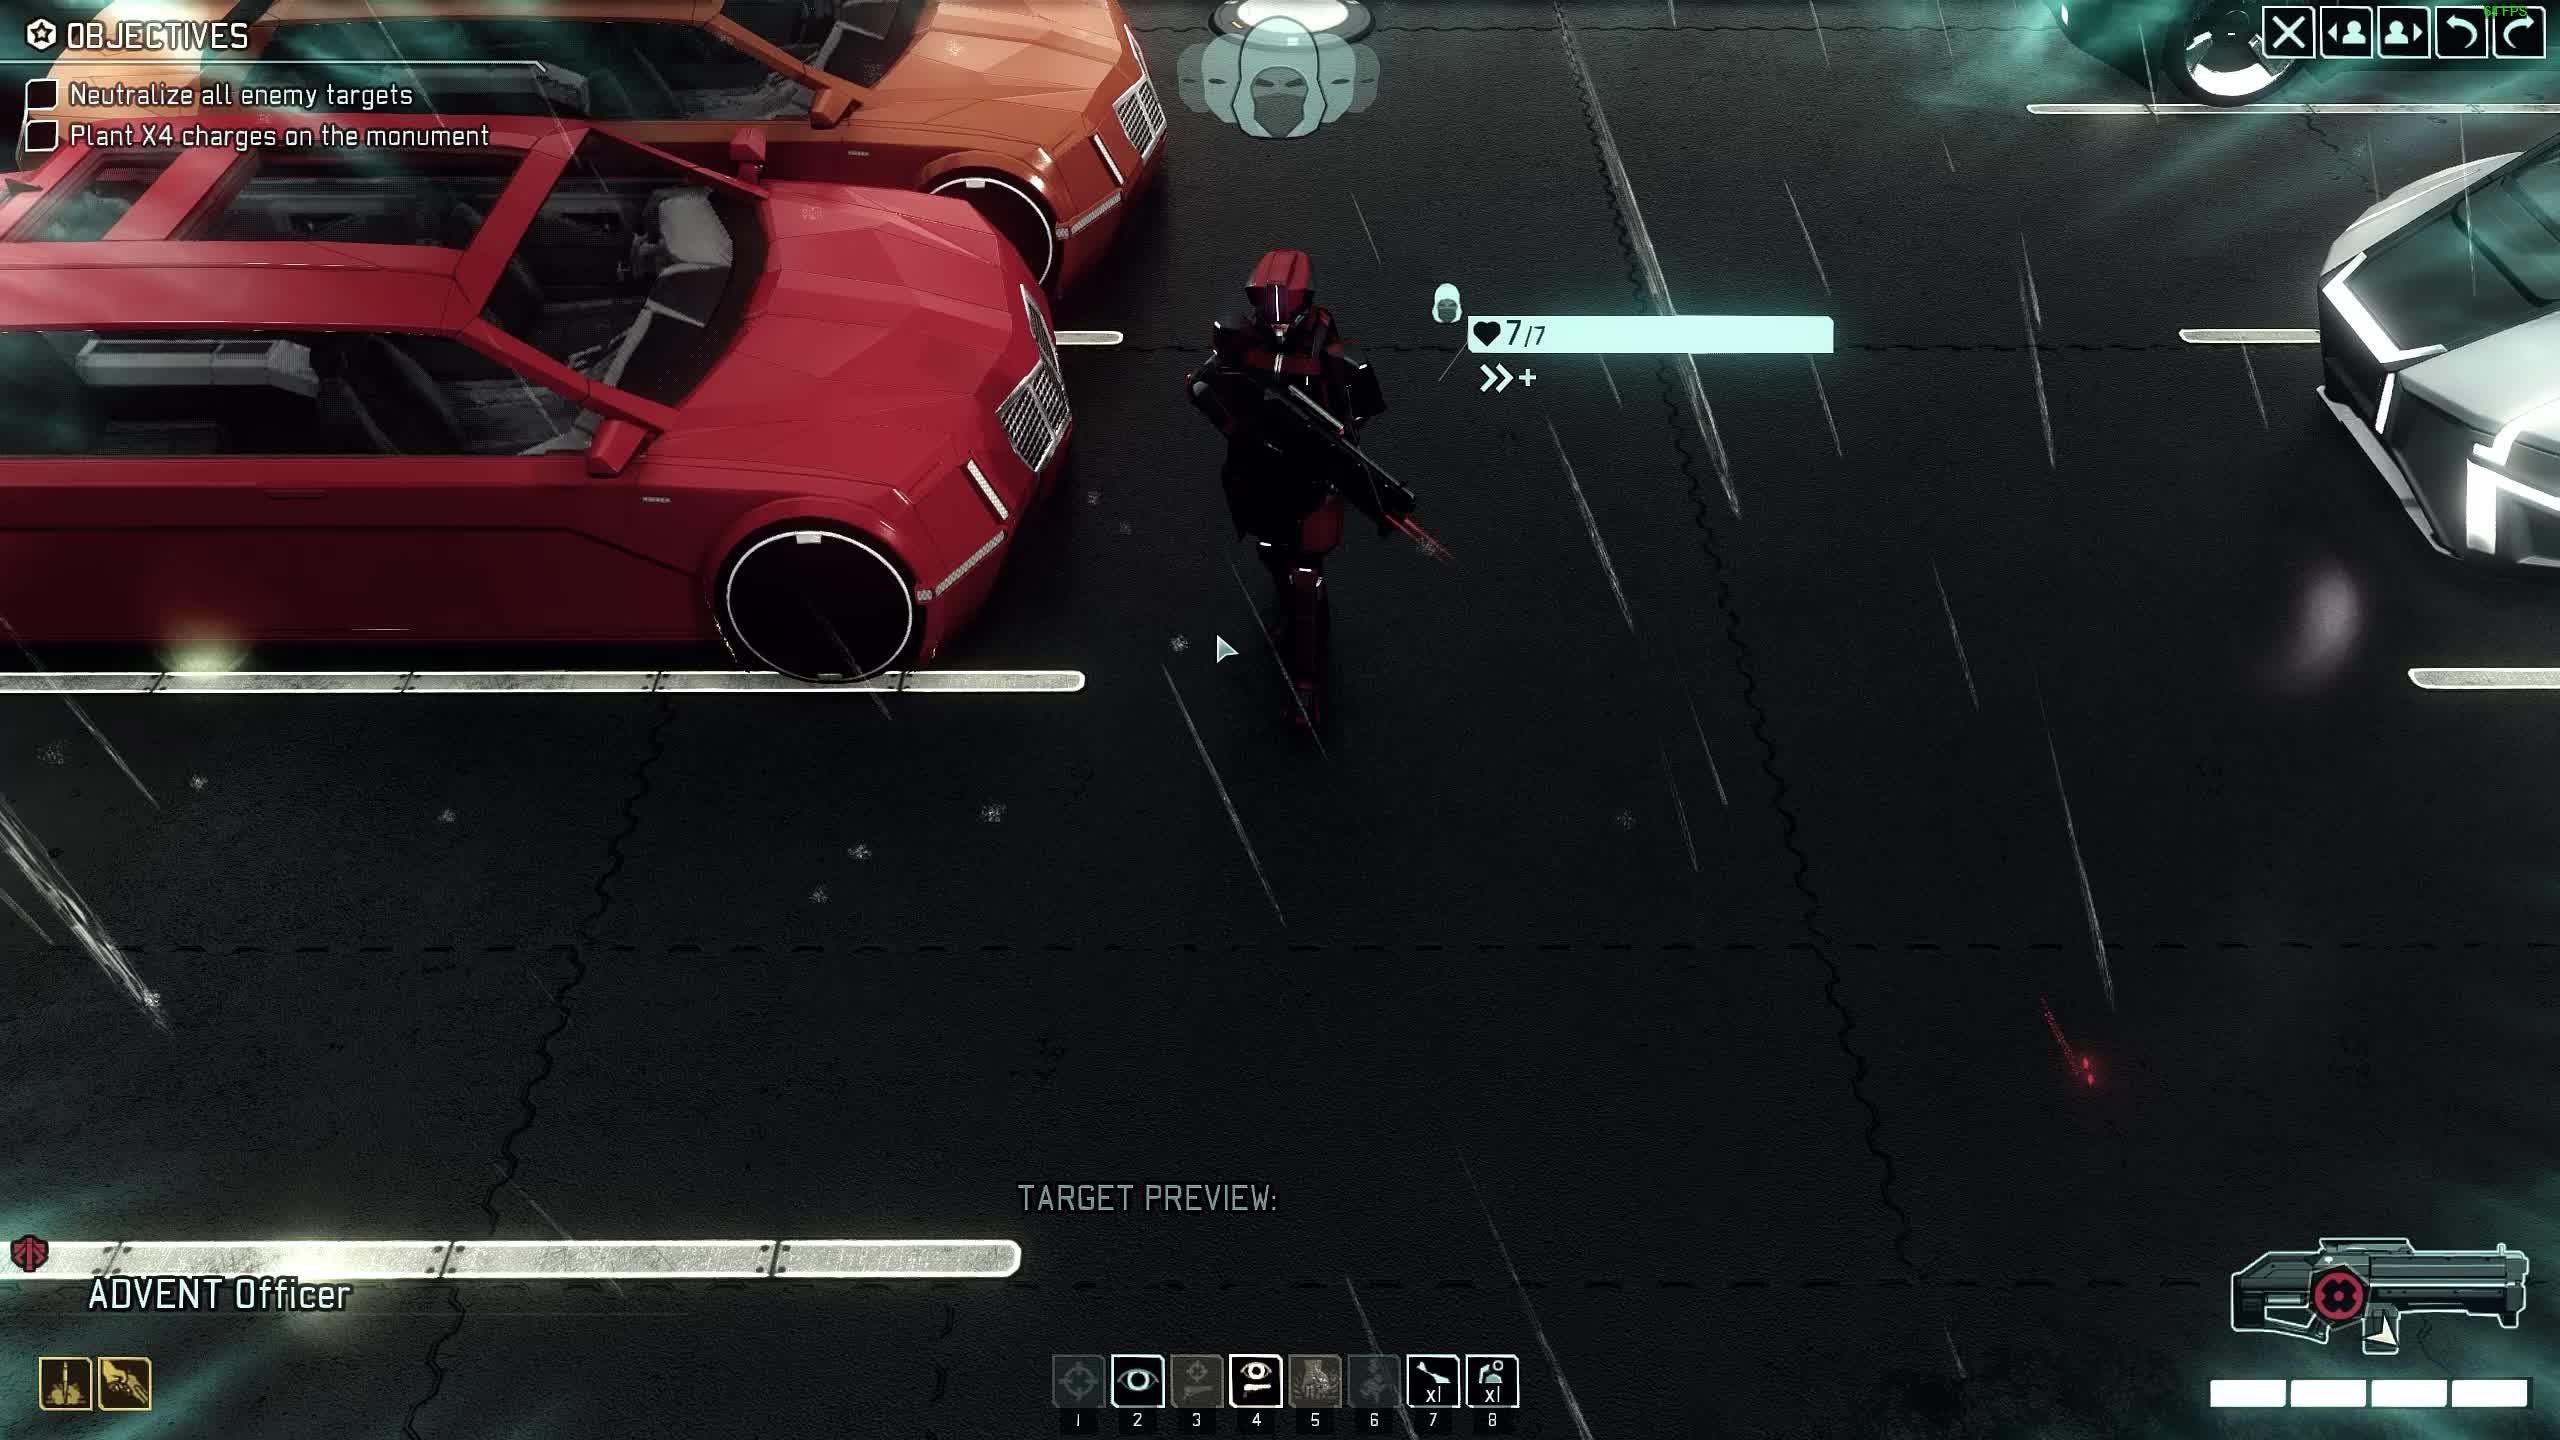 XCOM 2 2018.12.15 - 06.00.40.02 GIFs